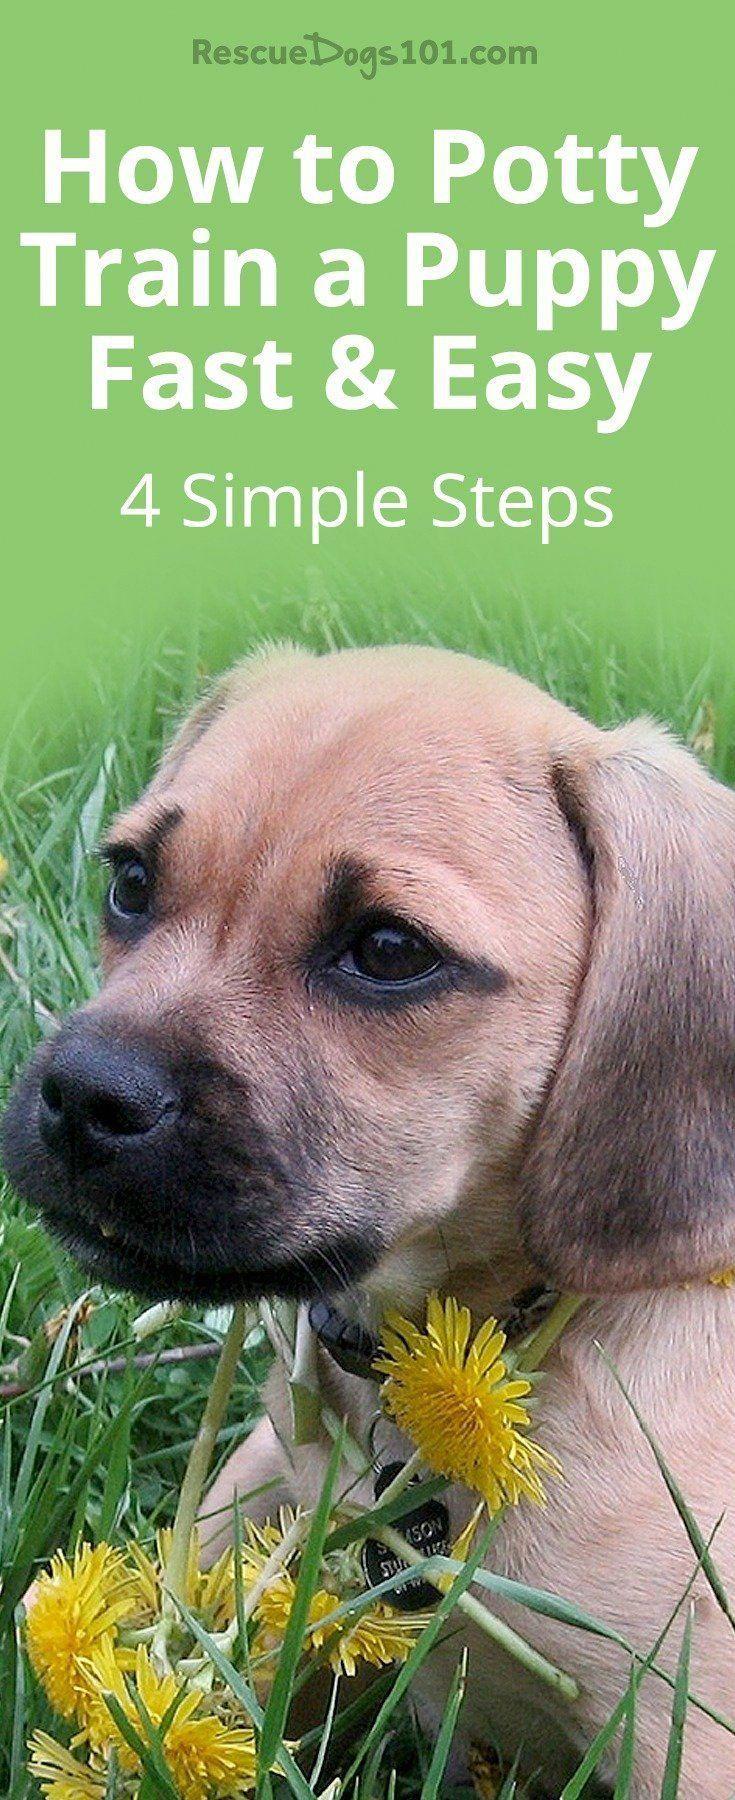 Tips on Potty Training Your Dog